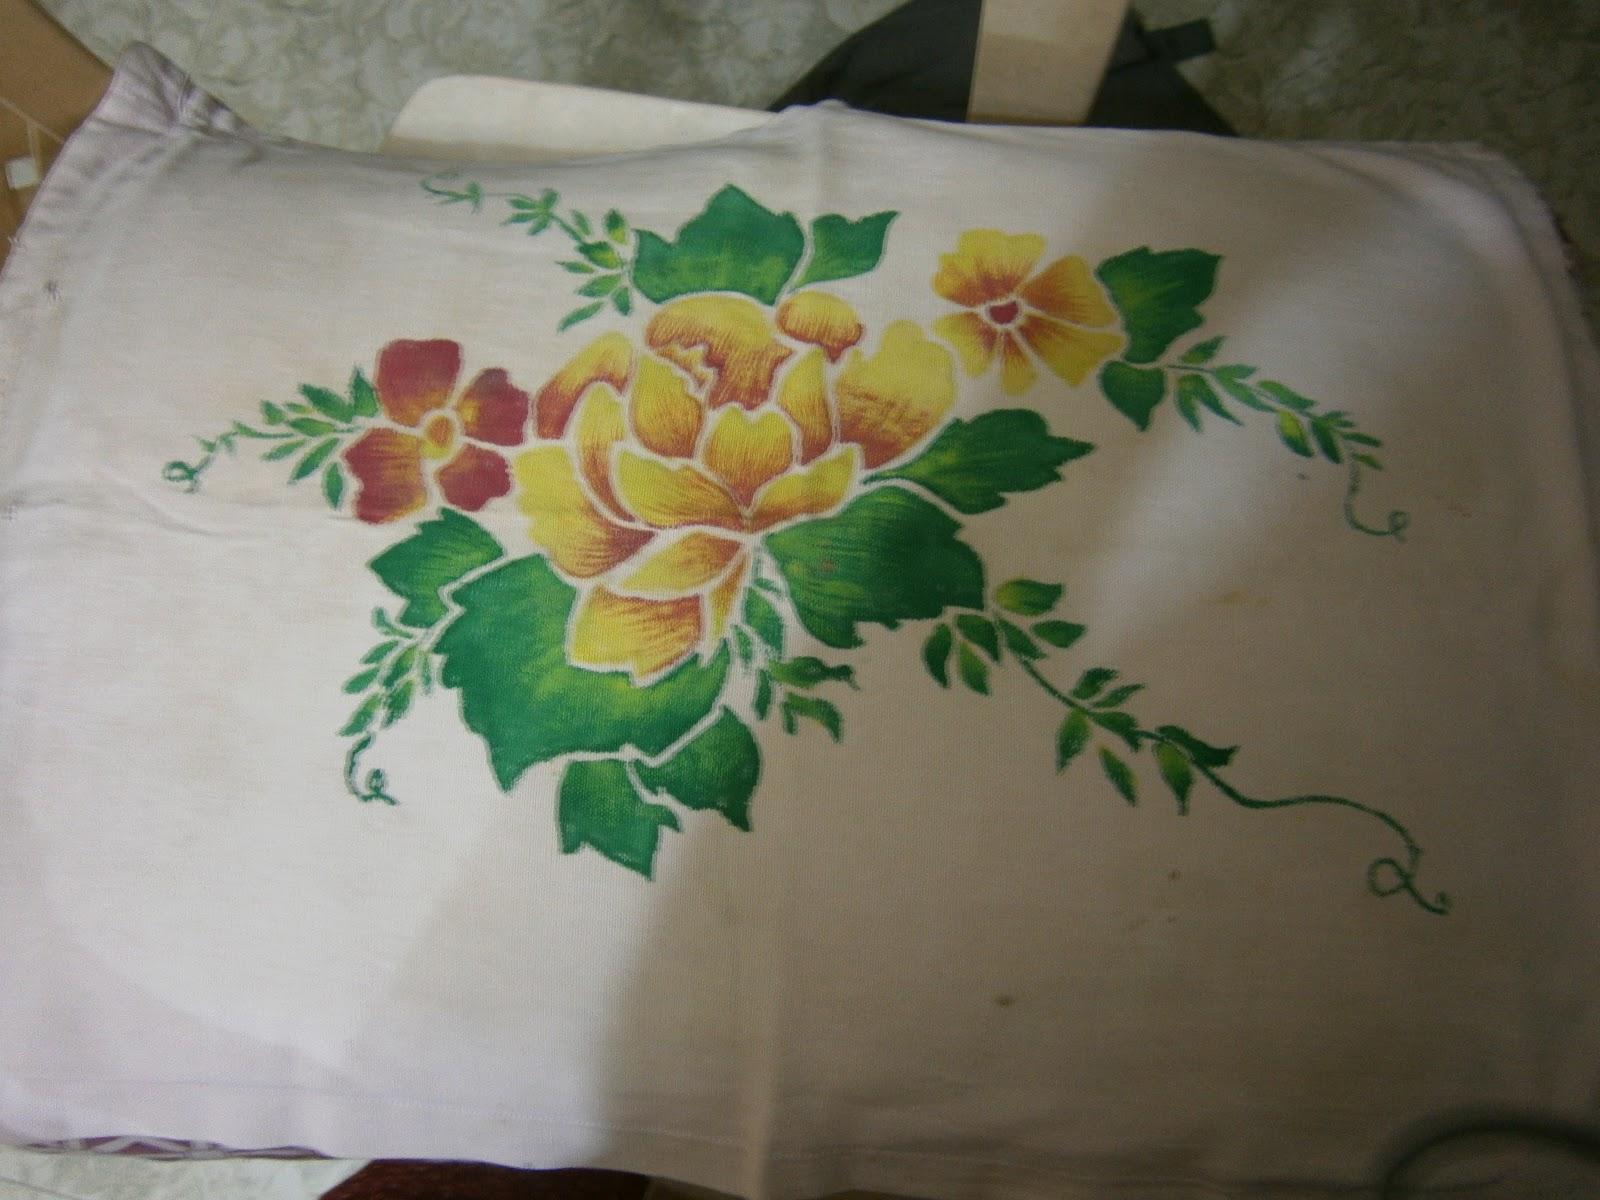 Pillow Cover Designing & Pillow Cover Designing | Discover The Beauty Beneath The Art pillowsntoast.com